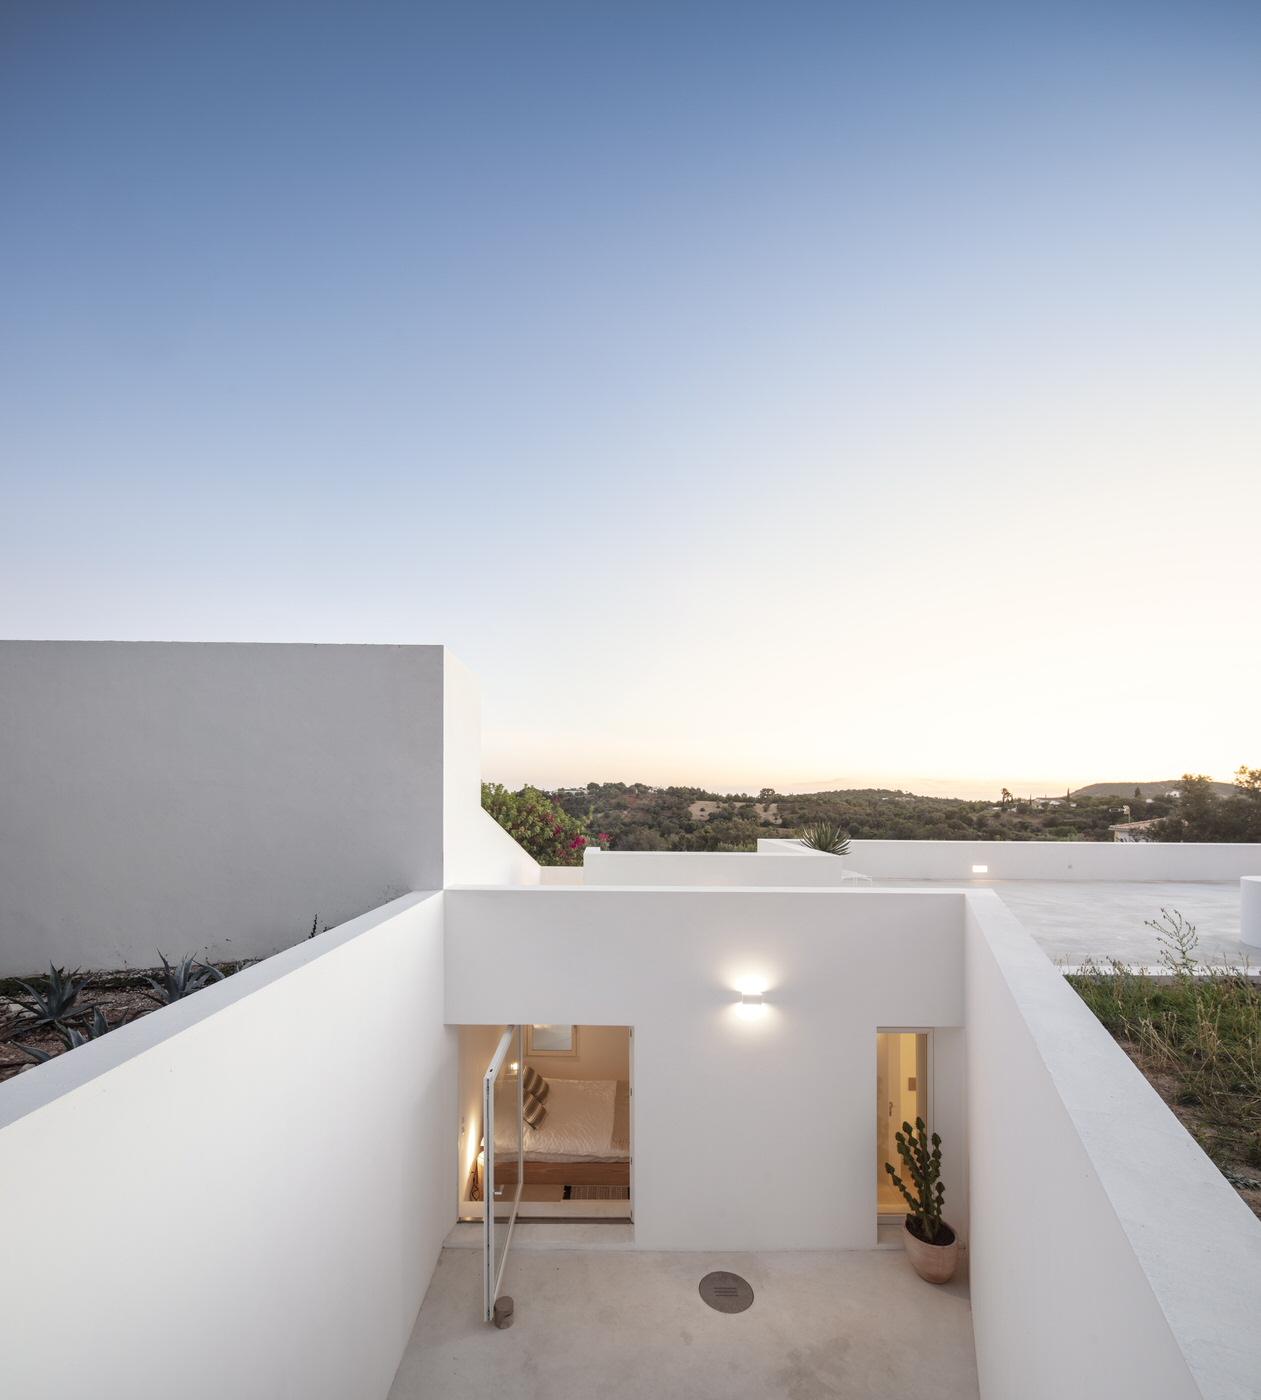 Zalig-Algarve-Casa-Luum-142-1_1